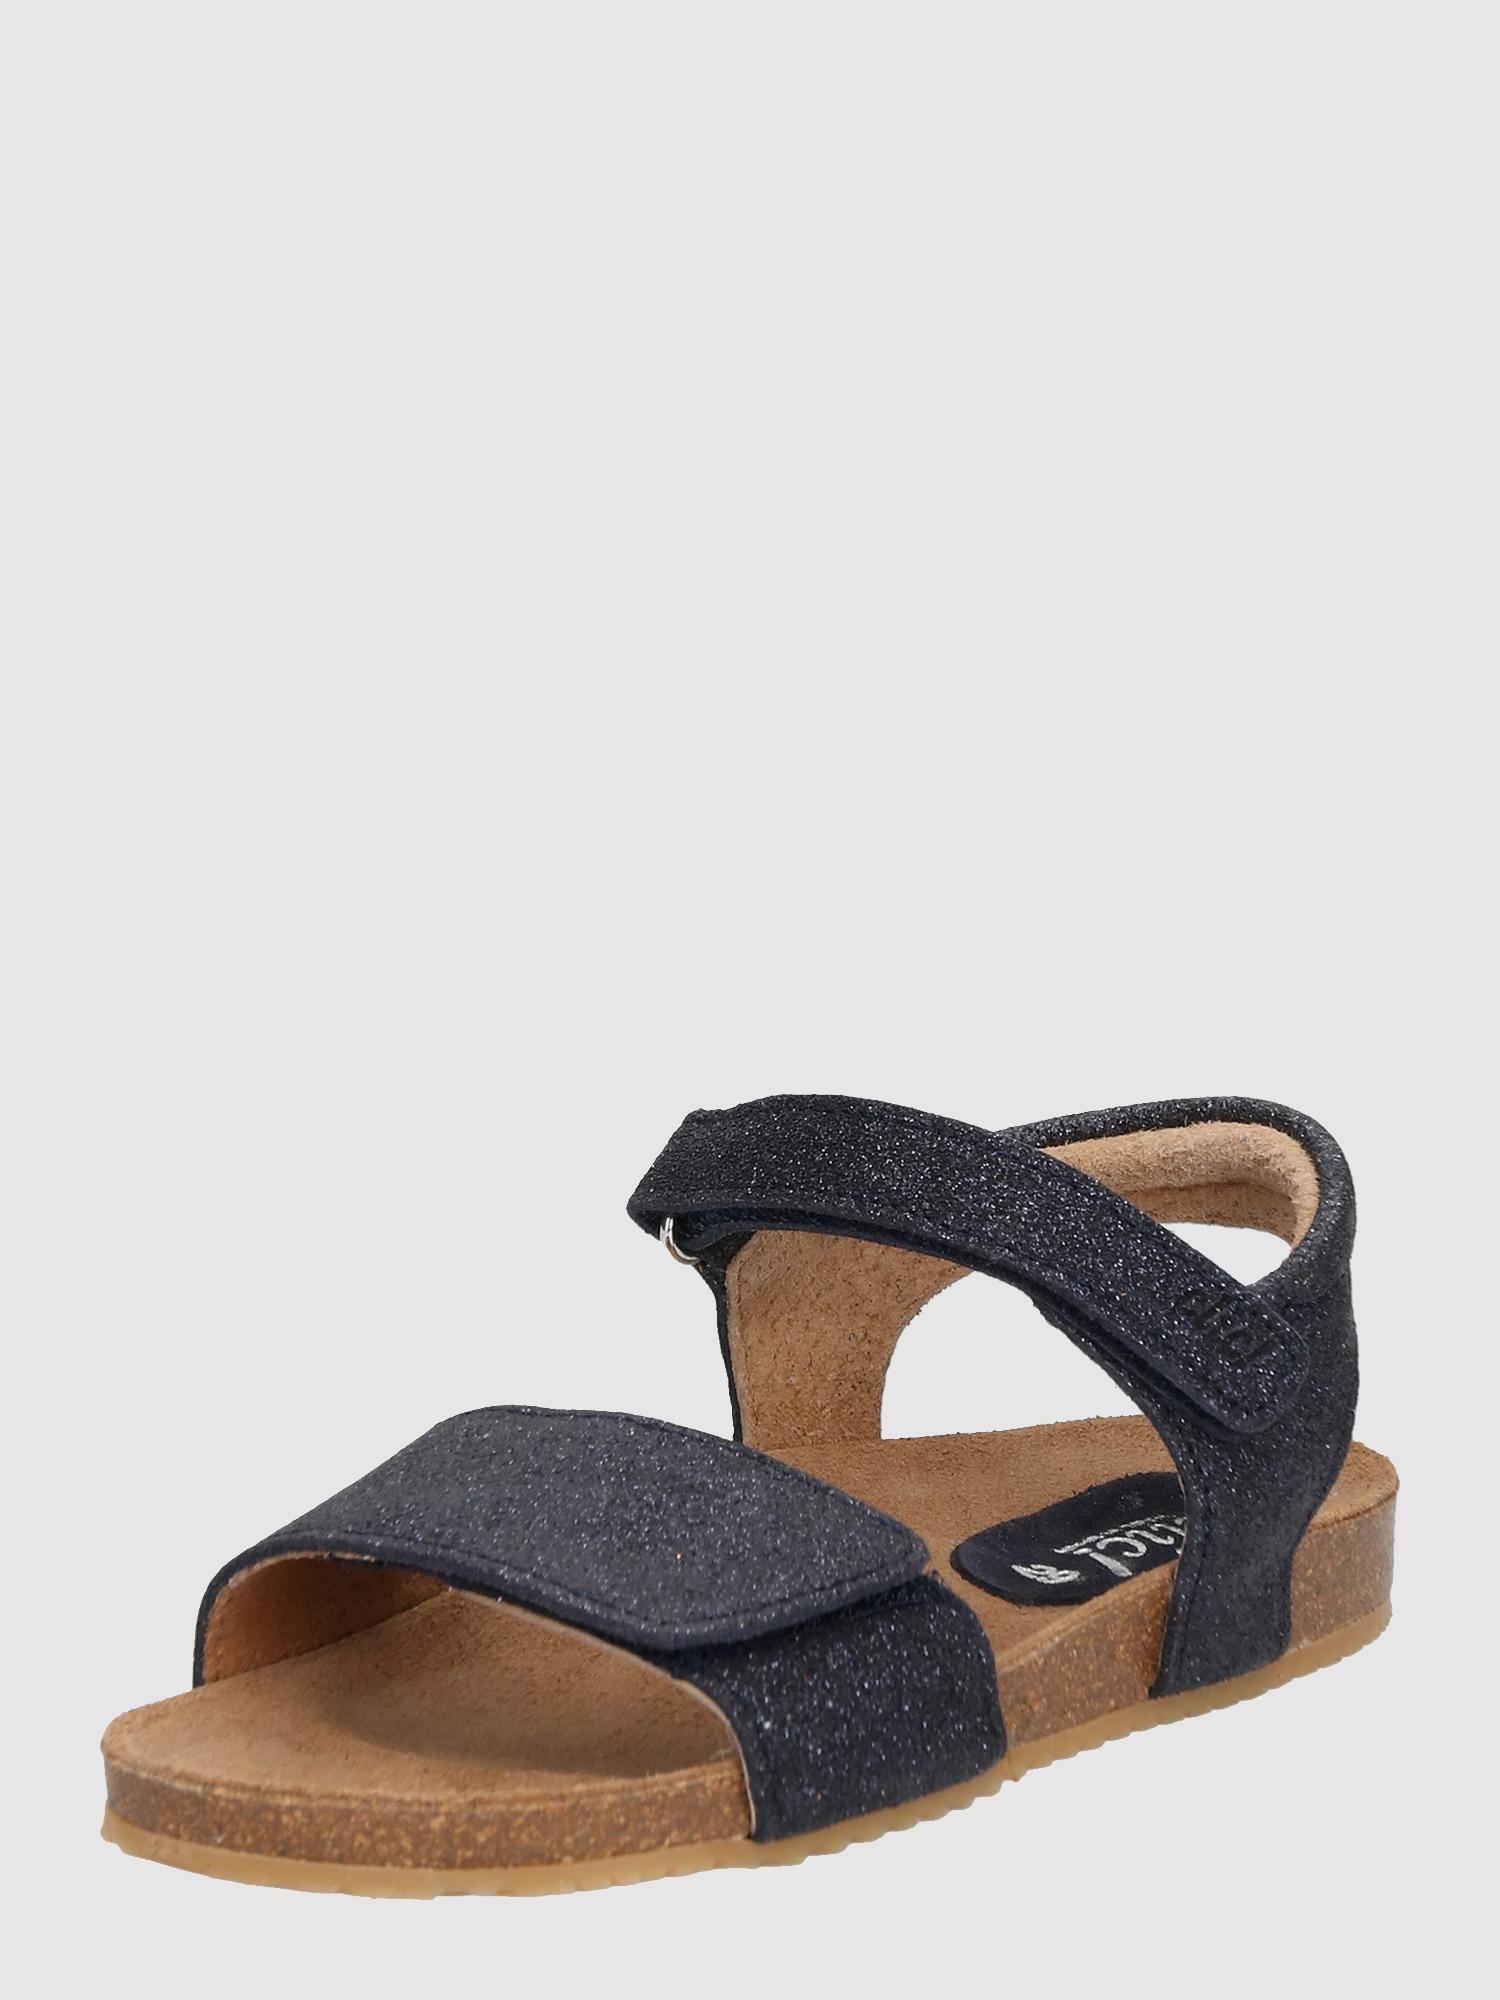 clic sandalen 39 17 39 mit glitzer effekt in blau about you. Black Bedroom Furniture Sets. Home Design Ideas